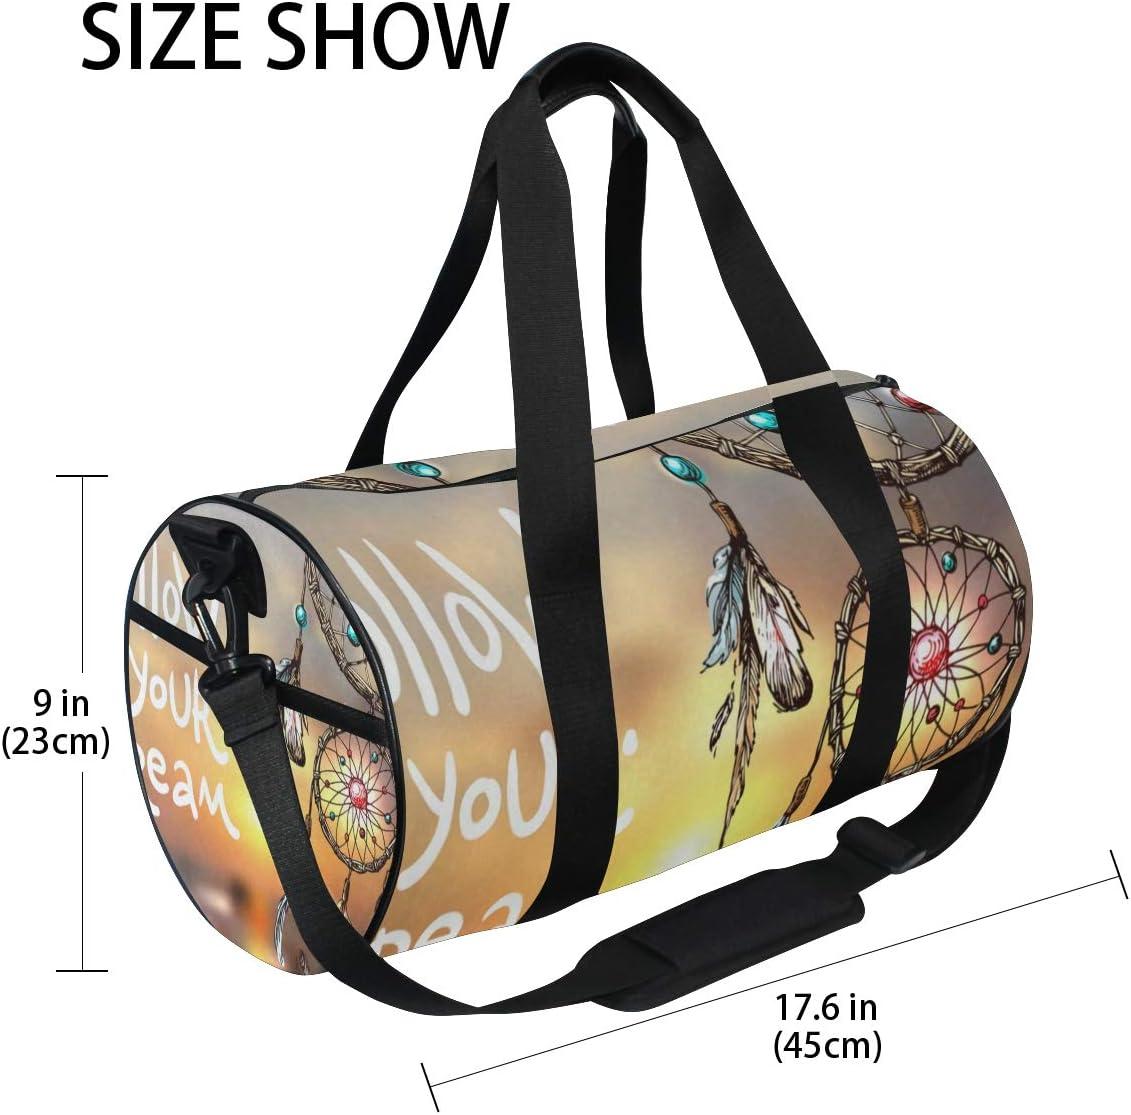 Duffel Bags Follow Your Dream Dreamcatcher Womens Gym Yoga Bag Small Fun Sports Bag for Men